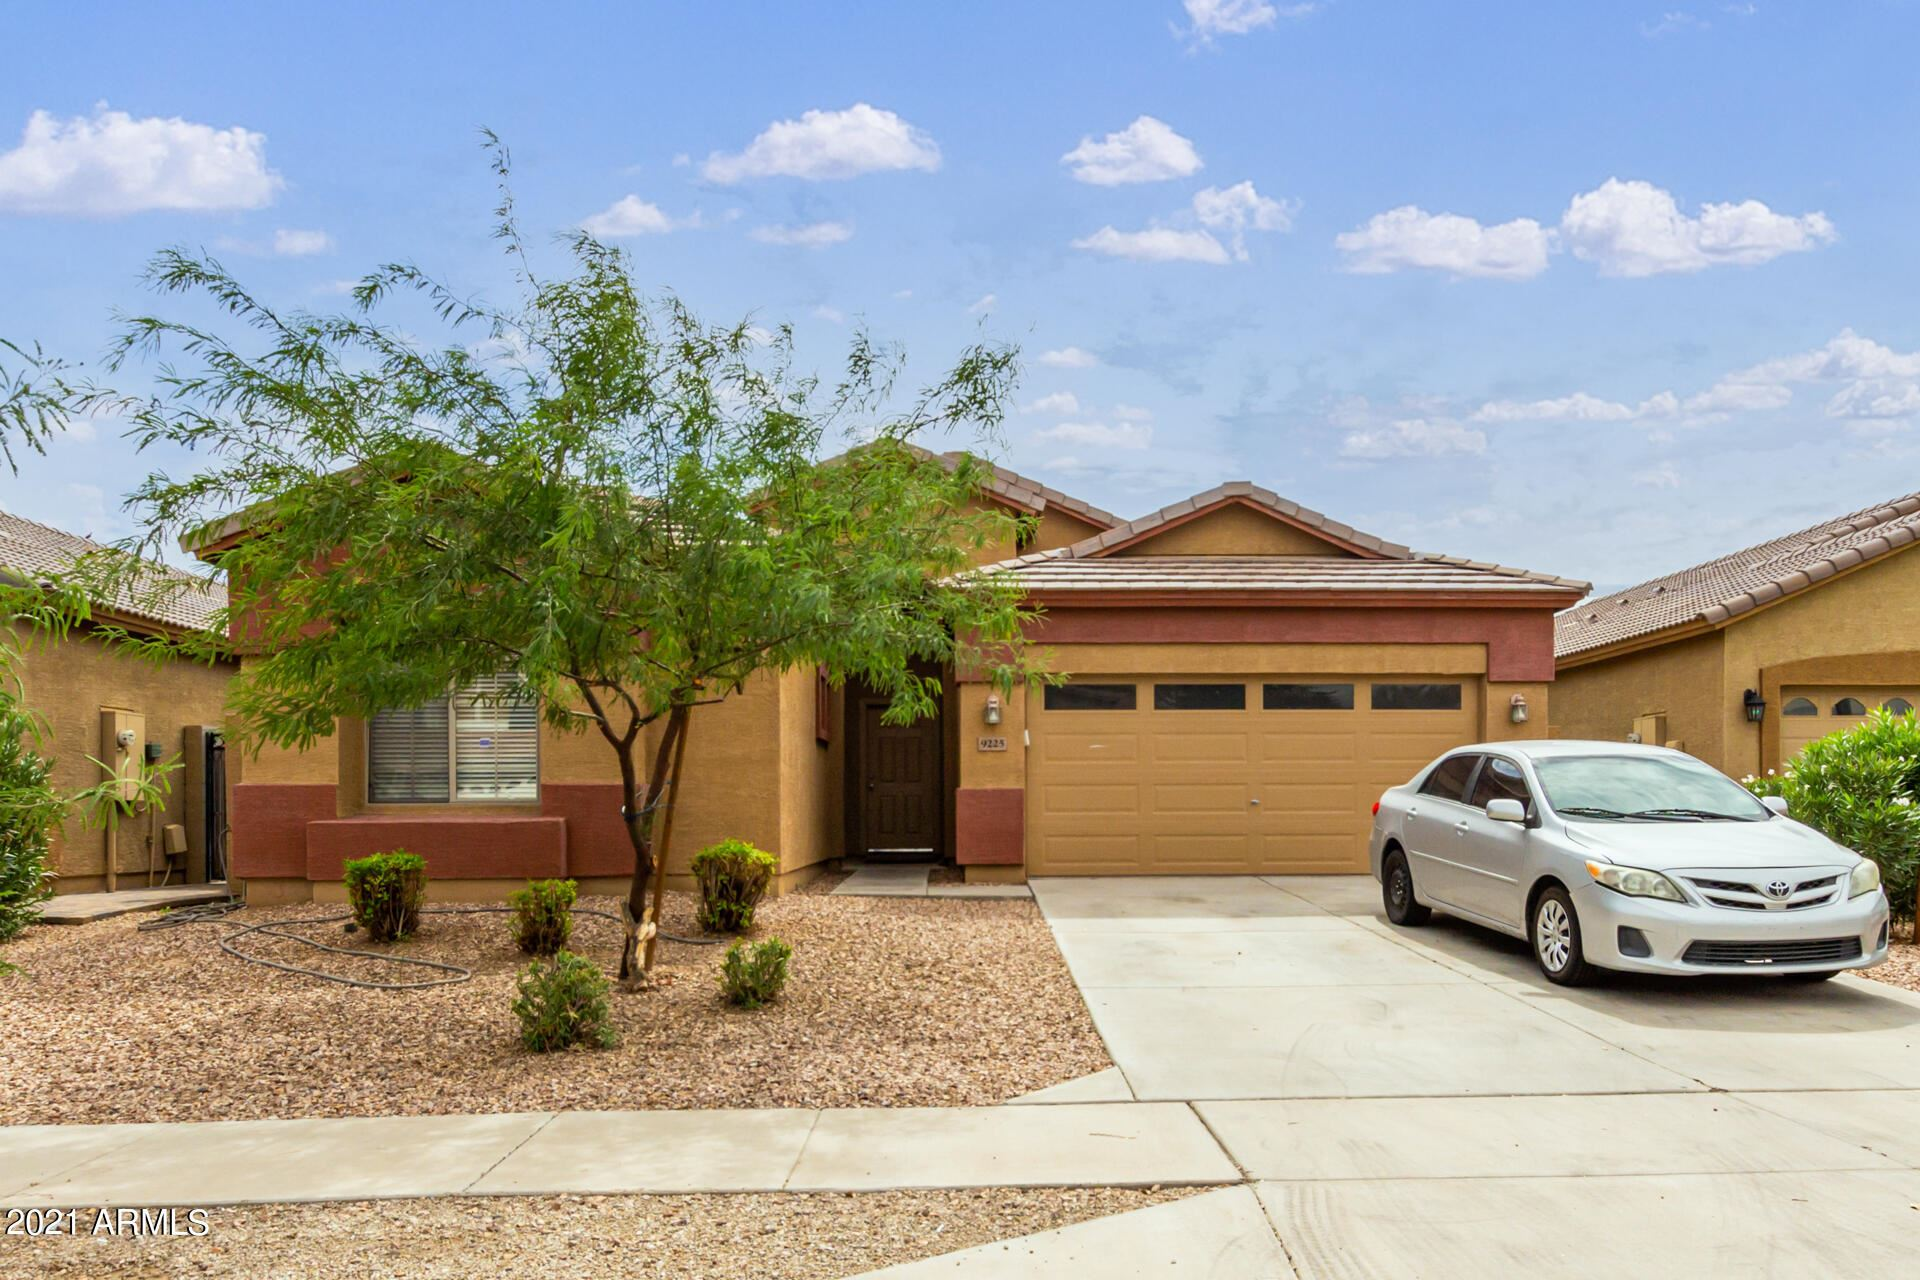 Photo of 9225 W ELWOOD Street, Tolleson, AZ 85353 (MLS # 6305345)